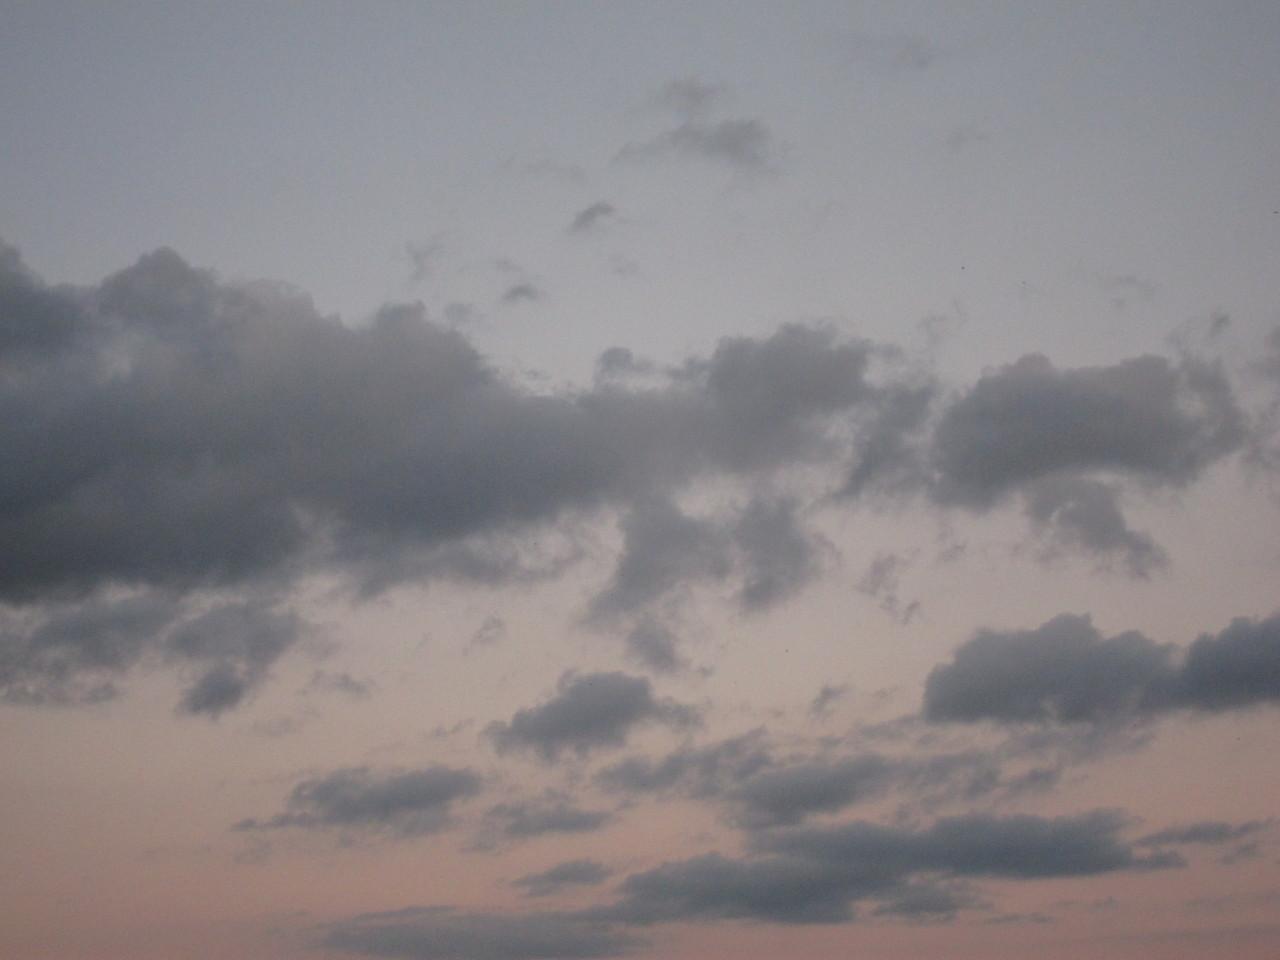 feel free to reblog © Soeren Baptism @soerenbaptism (instagram) www soerenbaptism com for more #soerenbaptism#goblincore#goblin things#goblin community#goblincore culture#goblin#naturecore#cozycore#honeycore#warmcore#meadowcore#farmcore#cottagecore#cabincore#corvidcore#countrycore#softcore#cozy#grandmacore#gardencore